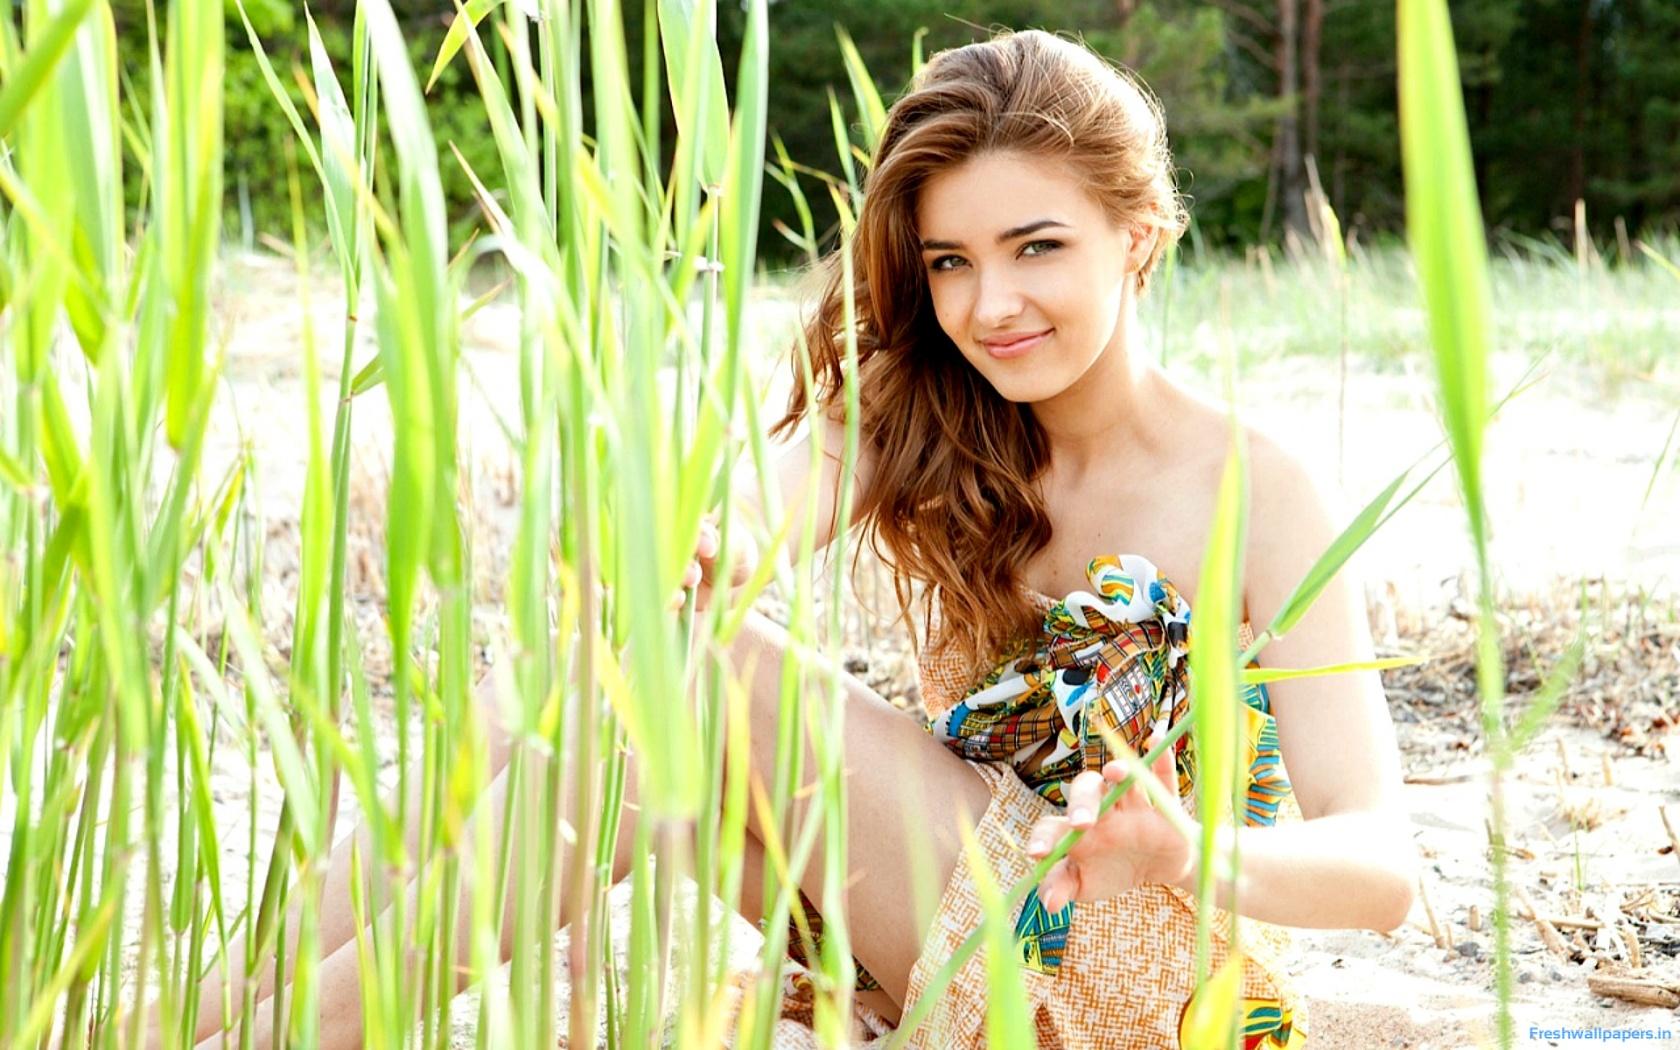 Adriana Through The Grass wallpaper